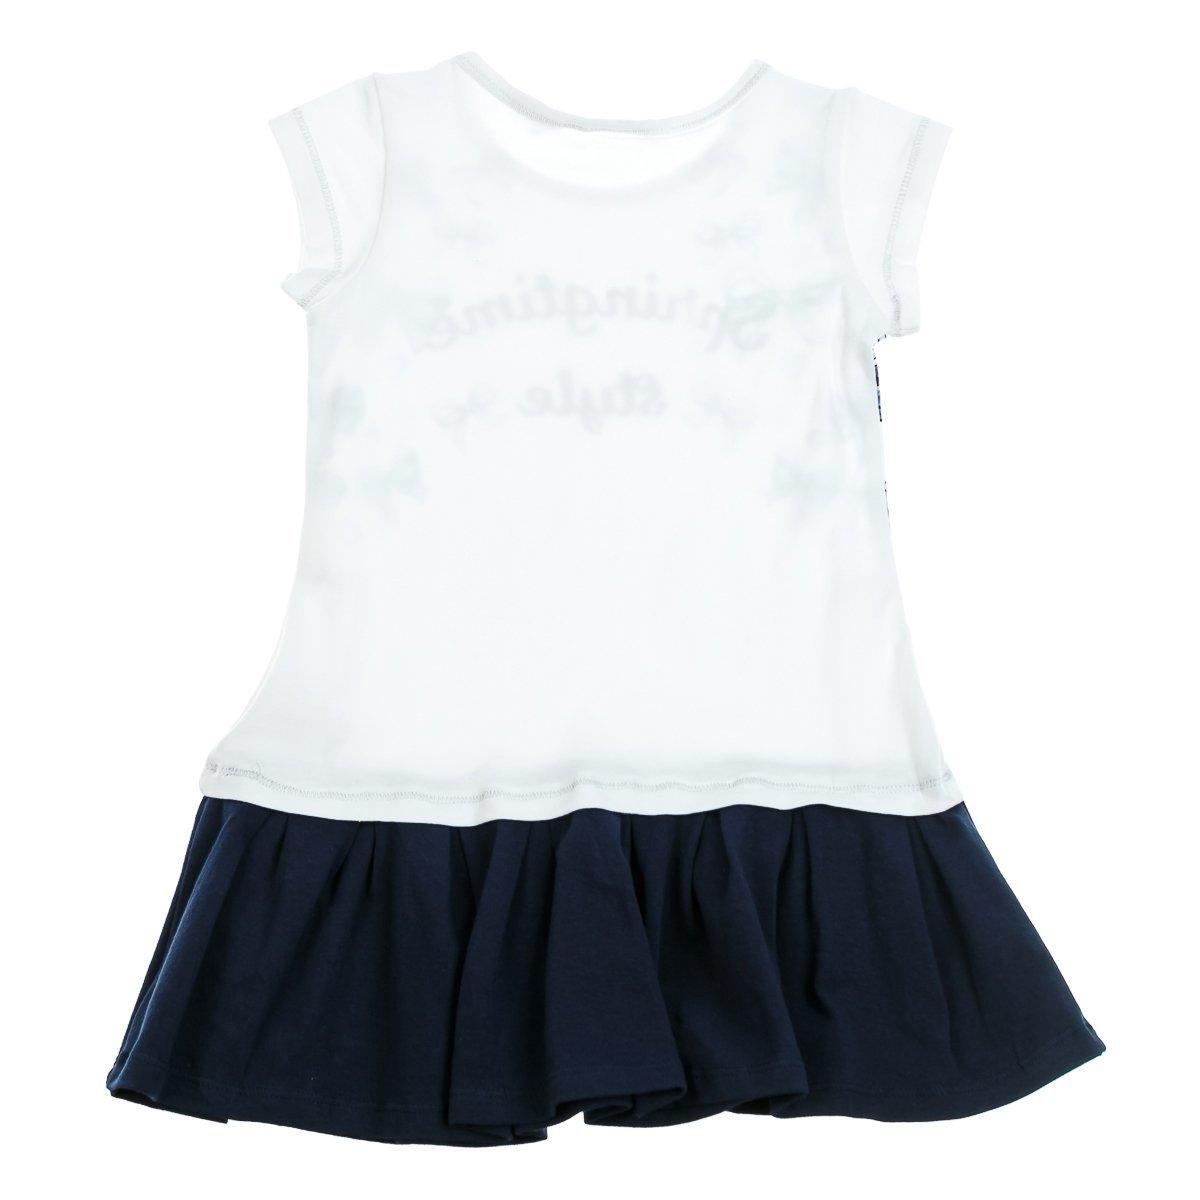 Платье BluKids Springtime Style, р. 104 5333530 ТМ: BluKids